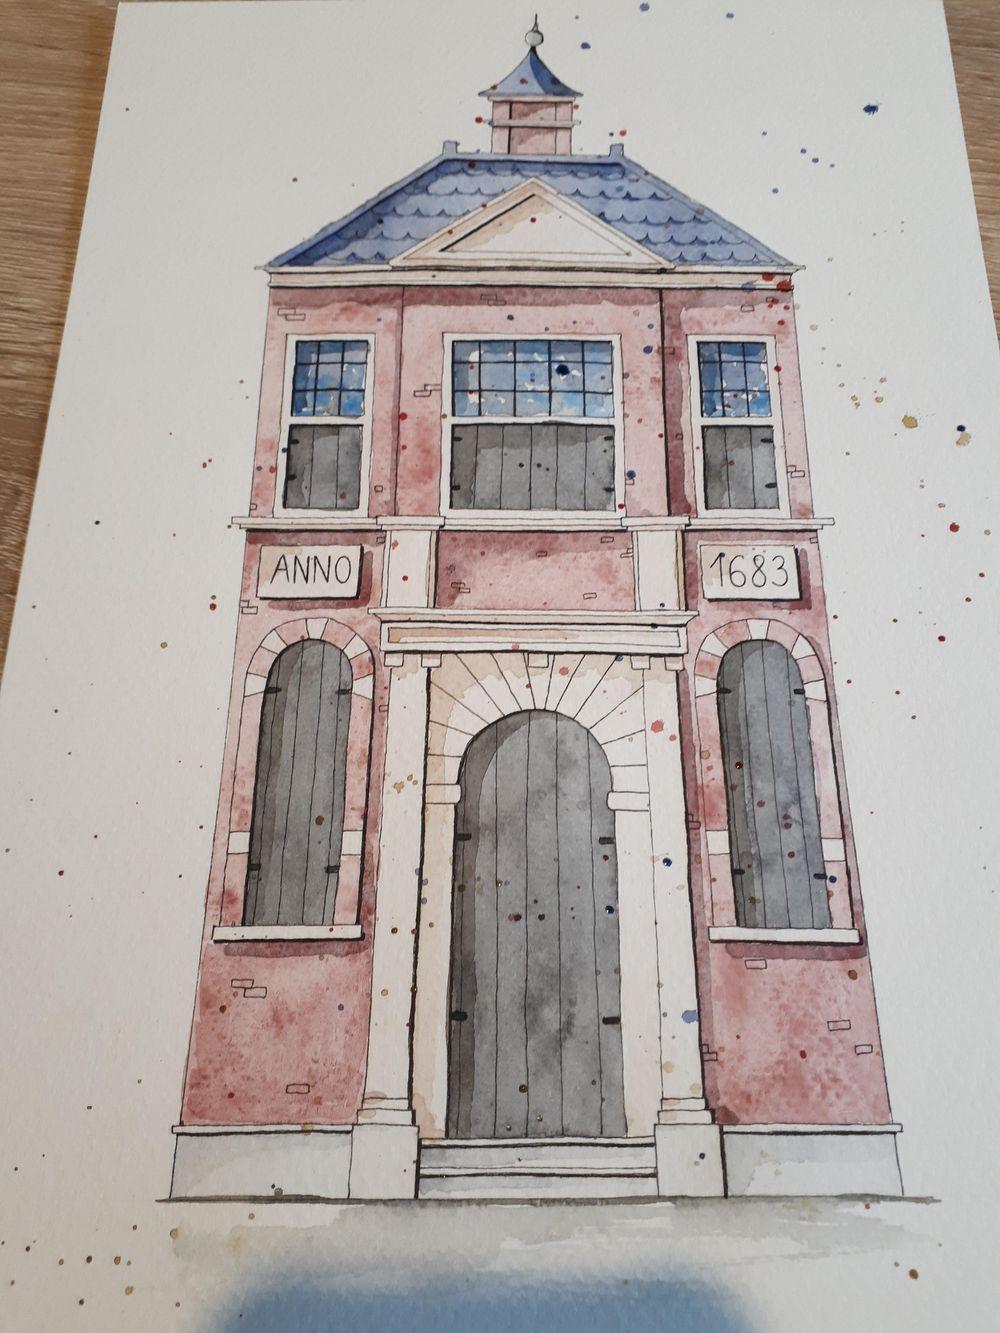 Sophie's Dutch House - image 1 - student project